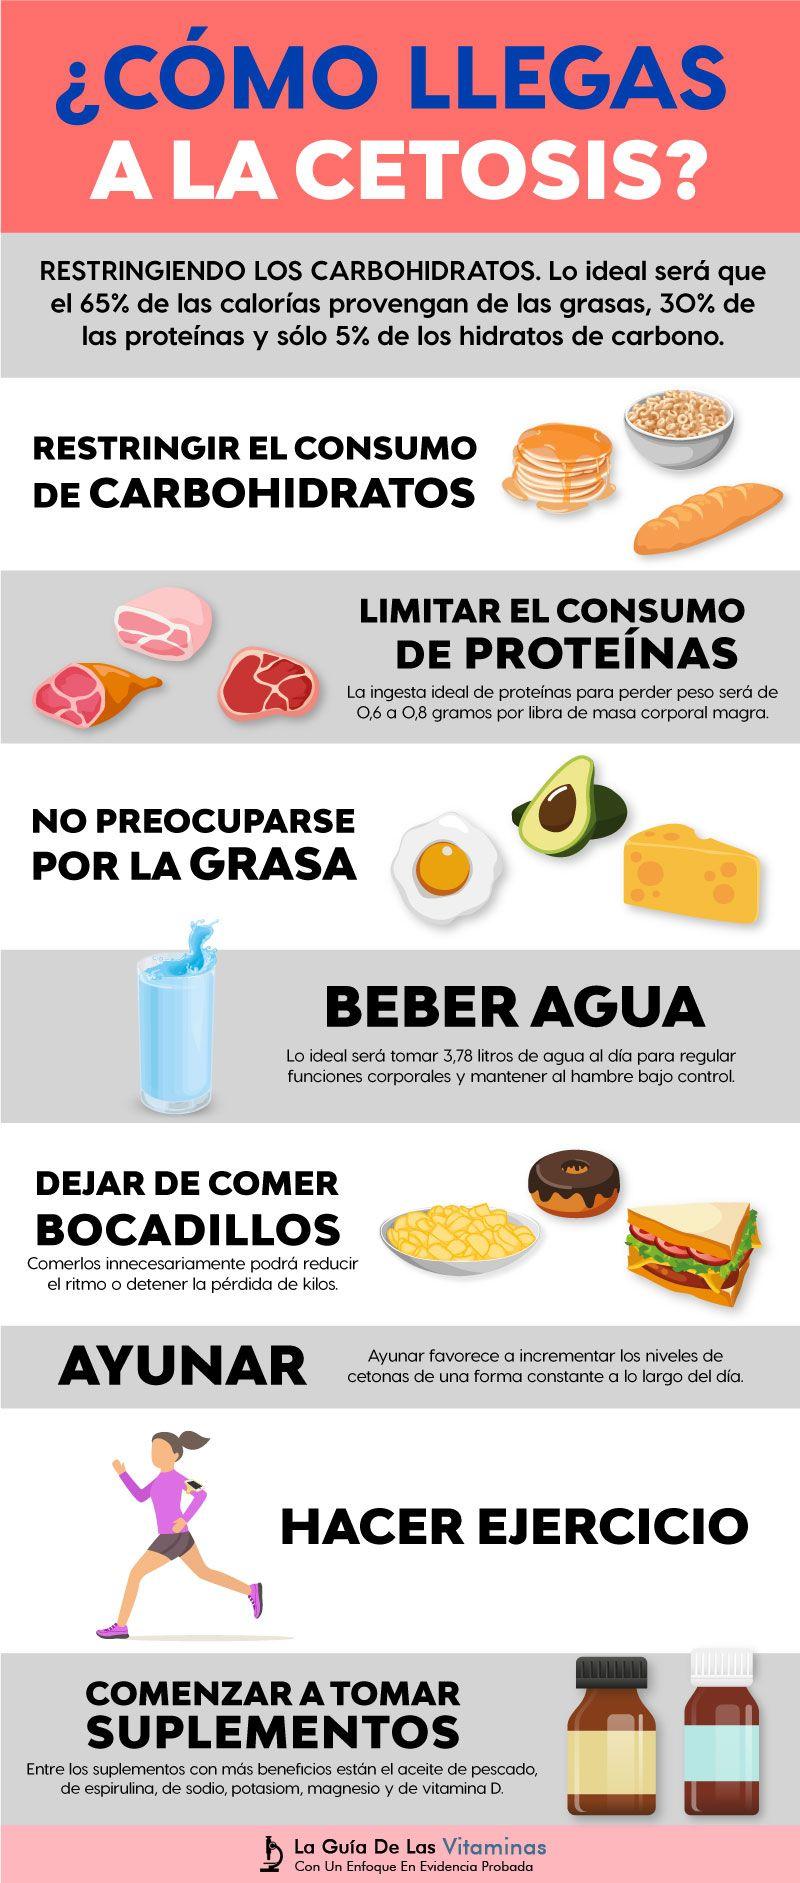 plan de dieta paso a paso para bajar de peso